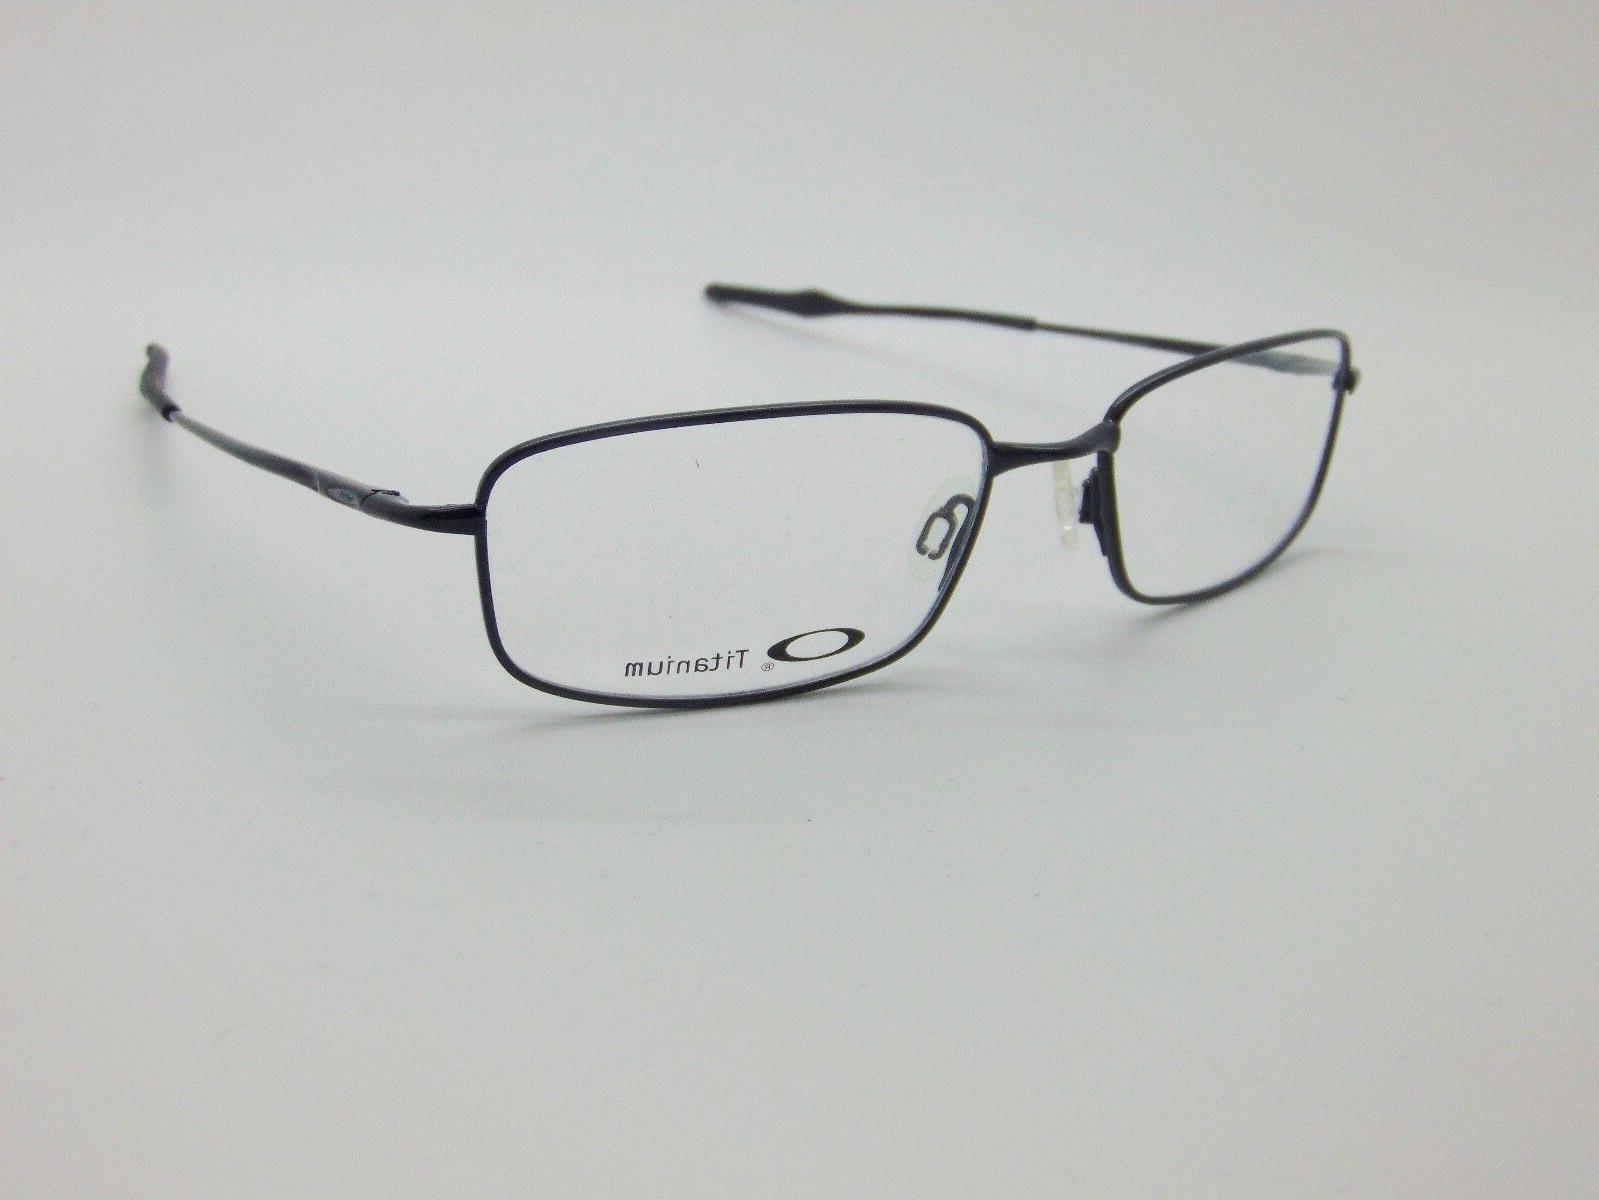 New OAKLEY OX3125-0155 Black 55mm Eyeglasses